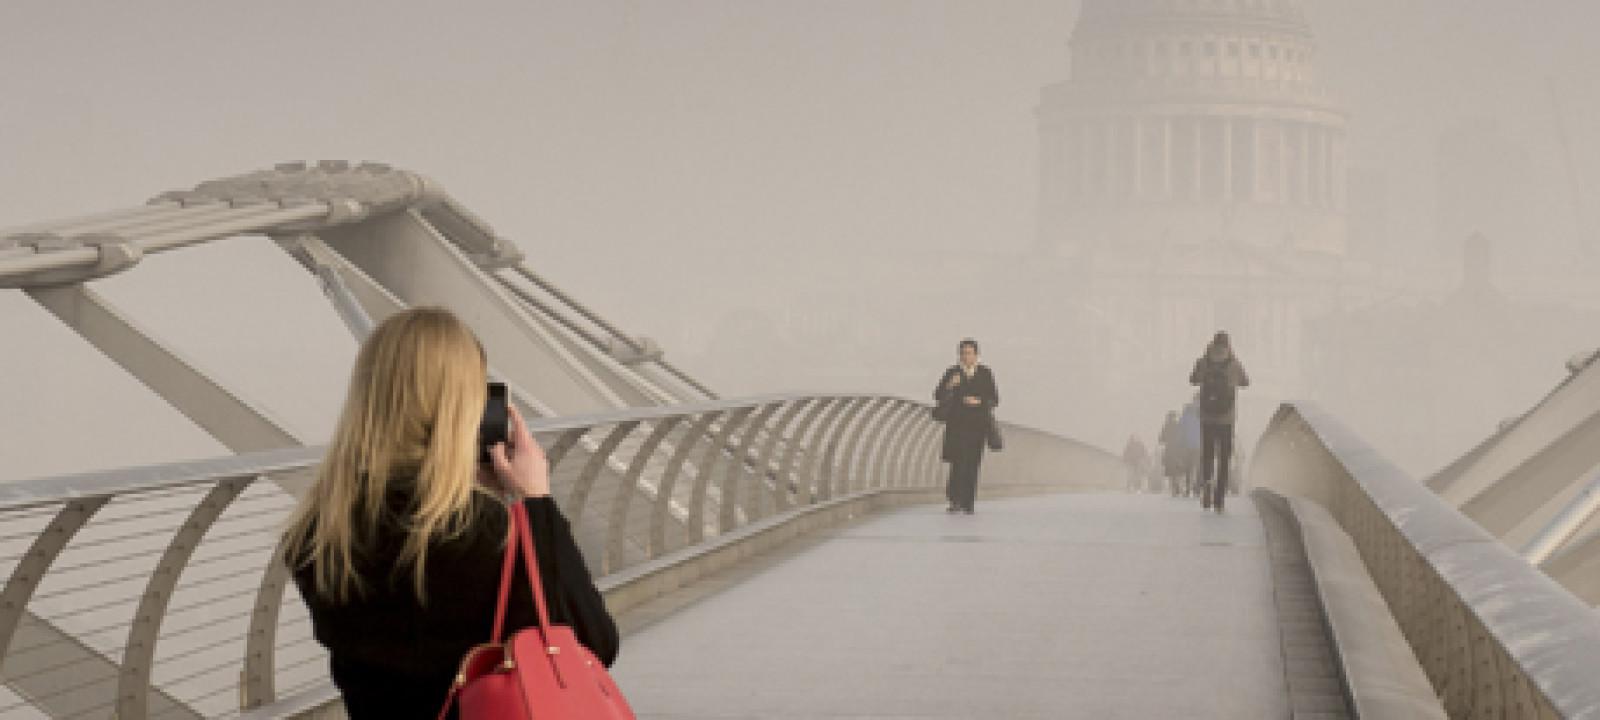 Fog in London, Britain – 13 Mar 2014